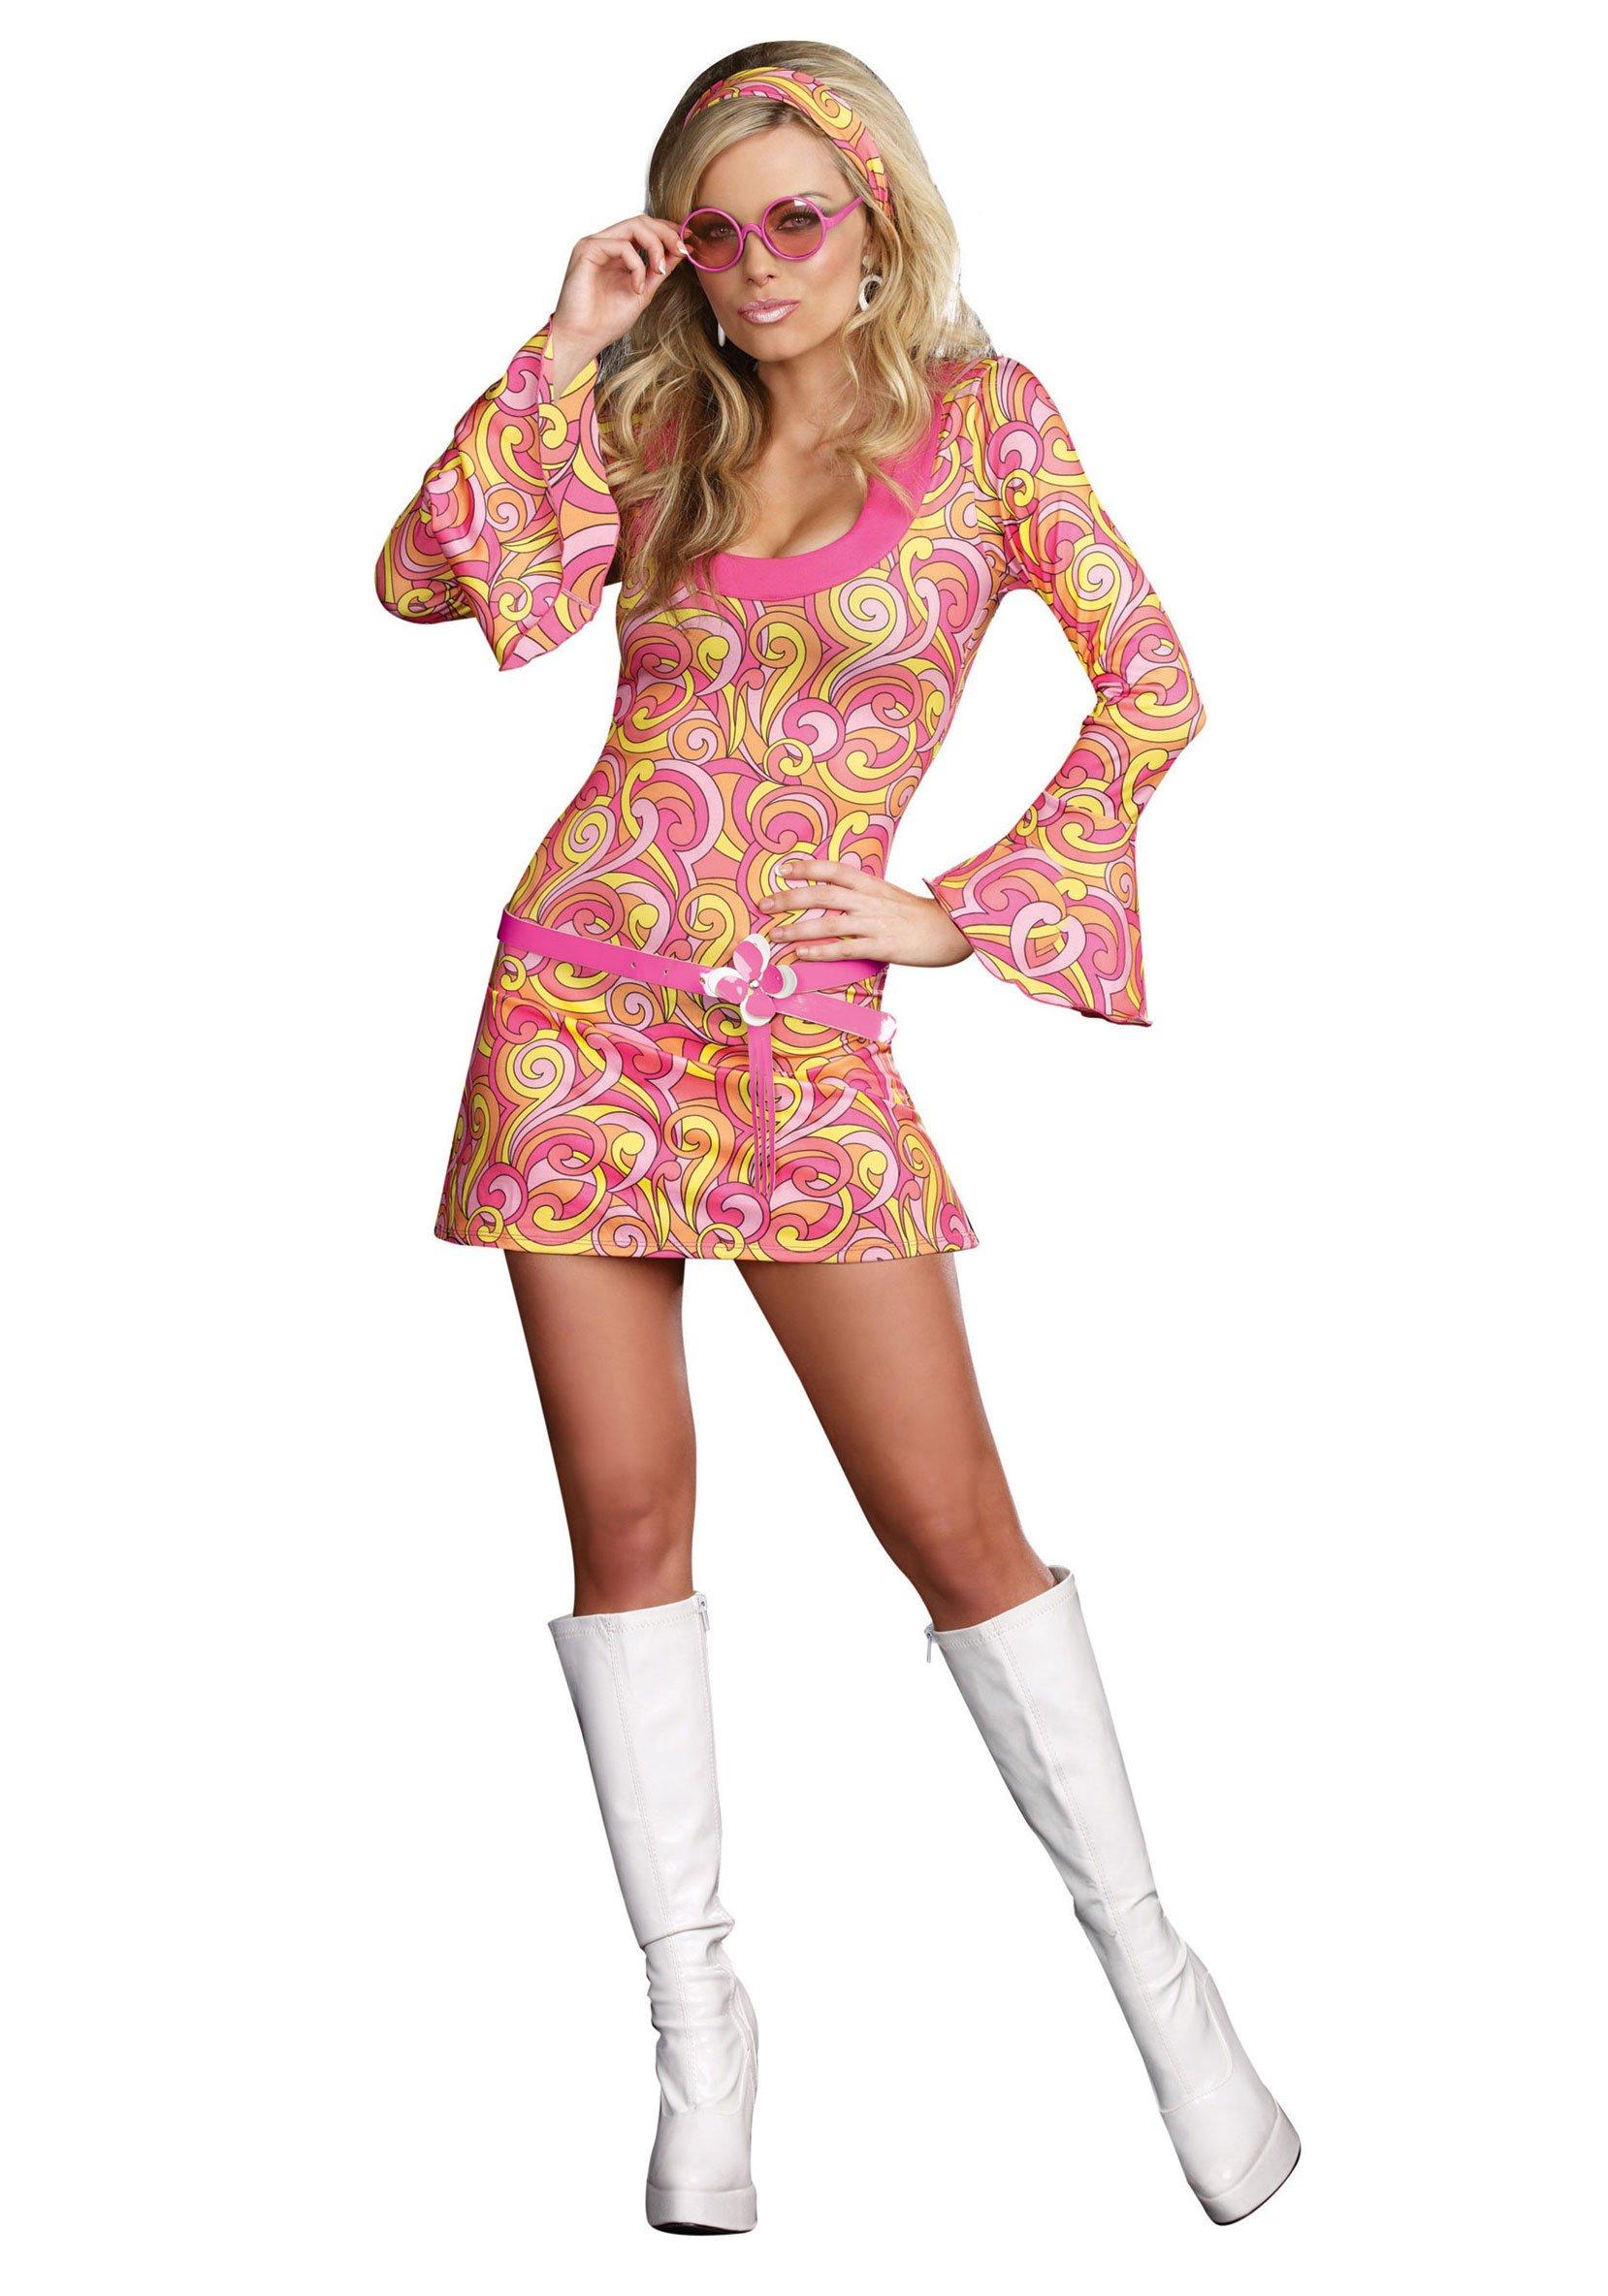 Dreamgirl Women's Go Go Gorgeous Costume, Multi, Small